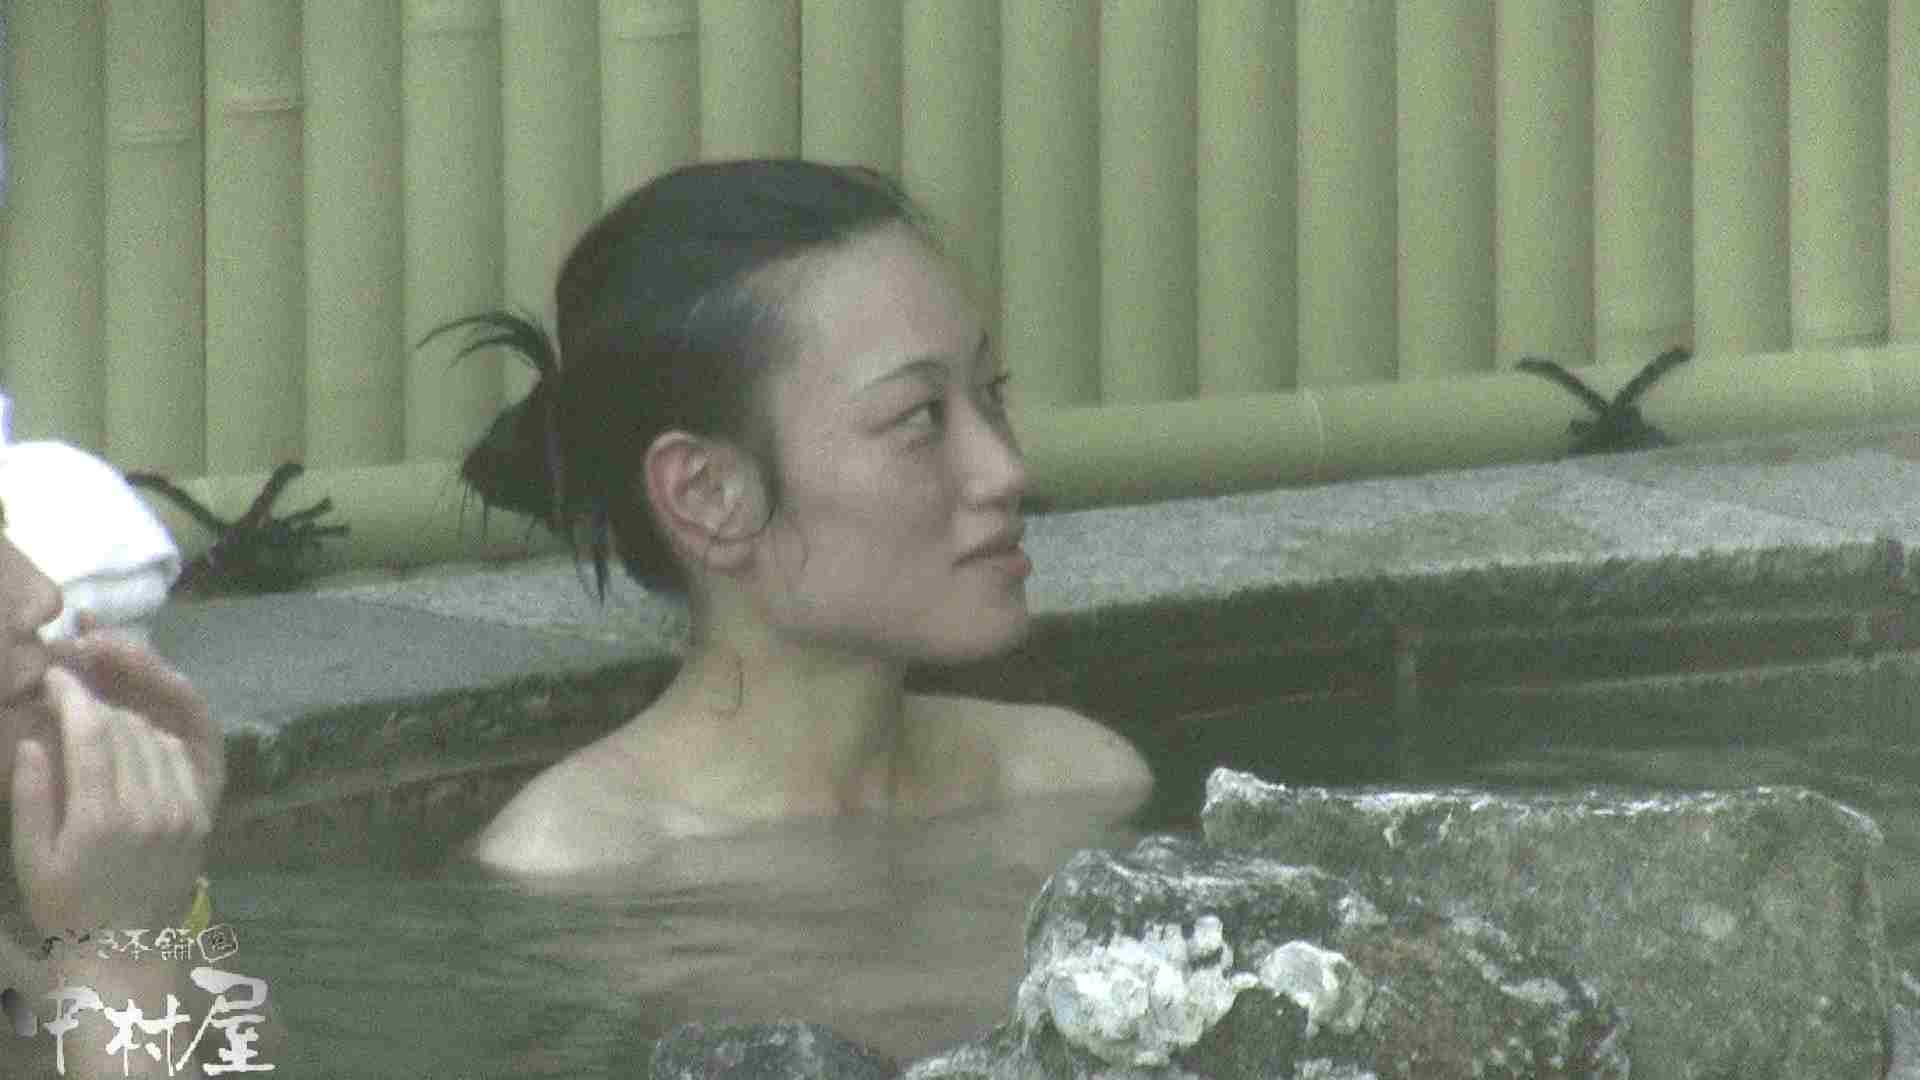 Aquaな露天風呂Vol.914 露天風呂編   盗撮シリーズ  83PIX 61